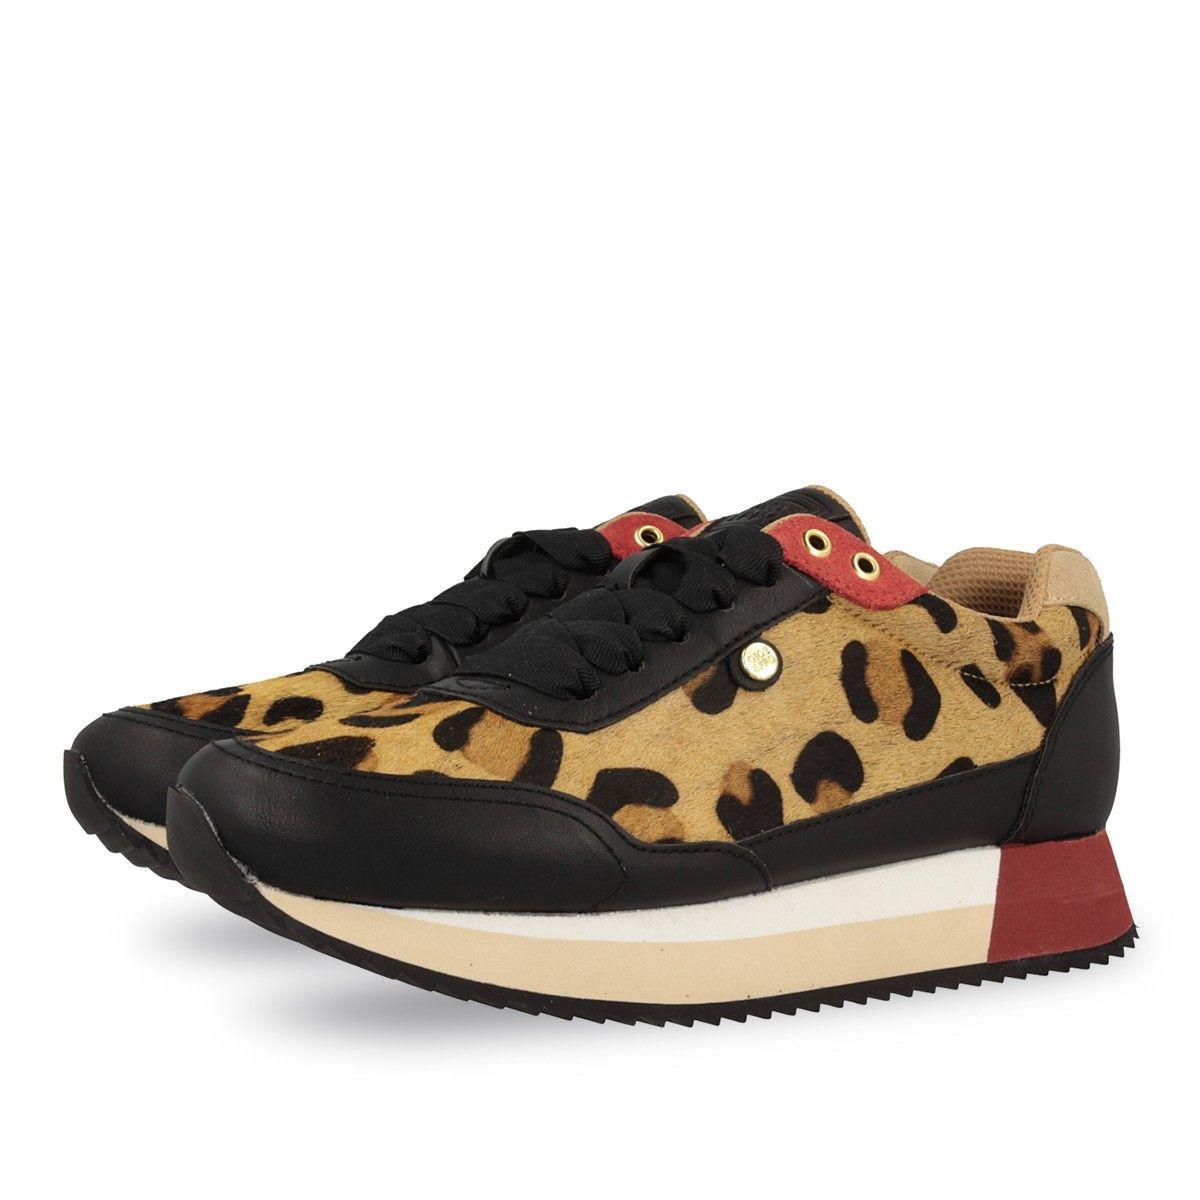 Zapatos negros Gioseppo para mujer c1ZQJ